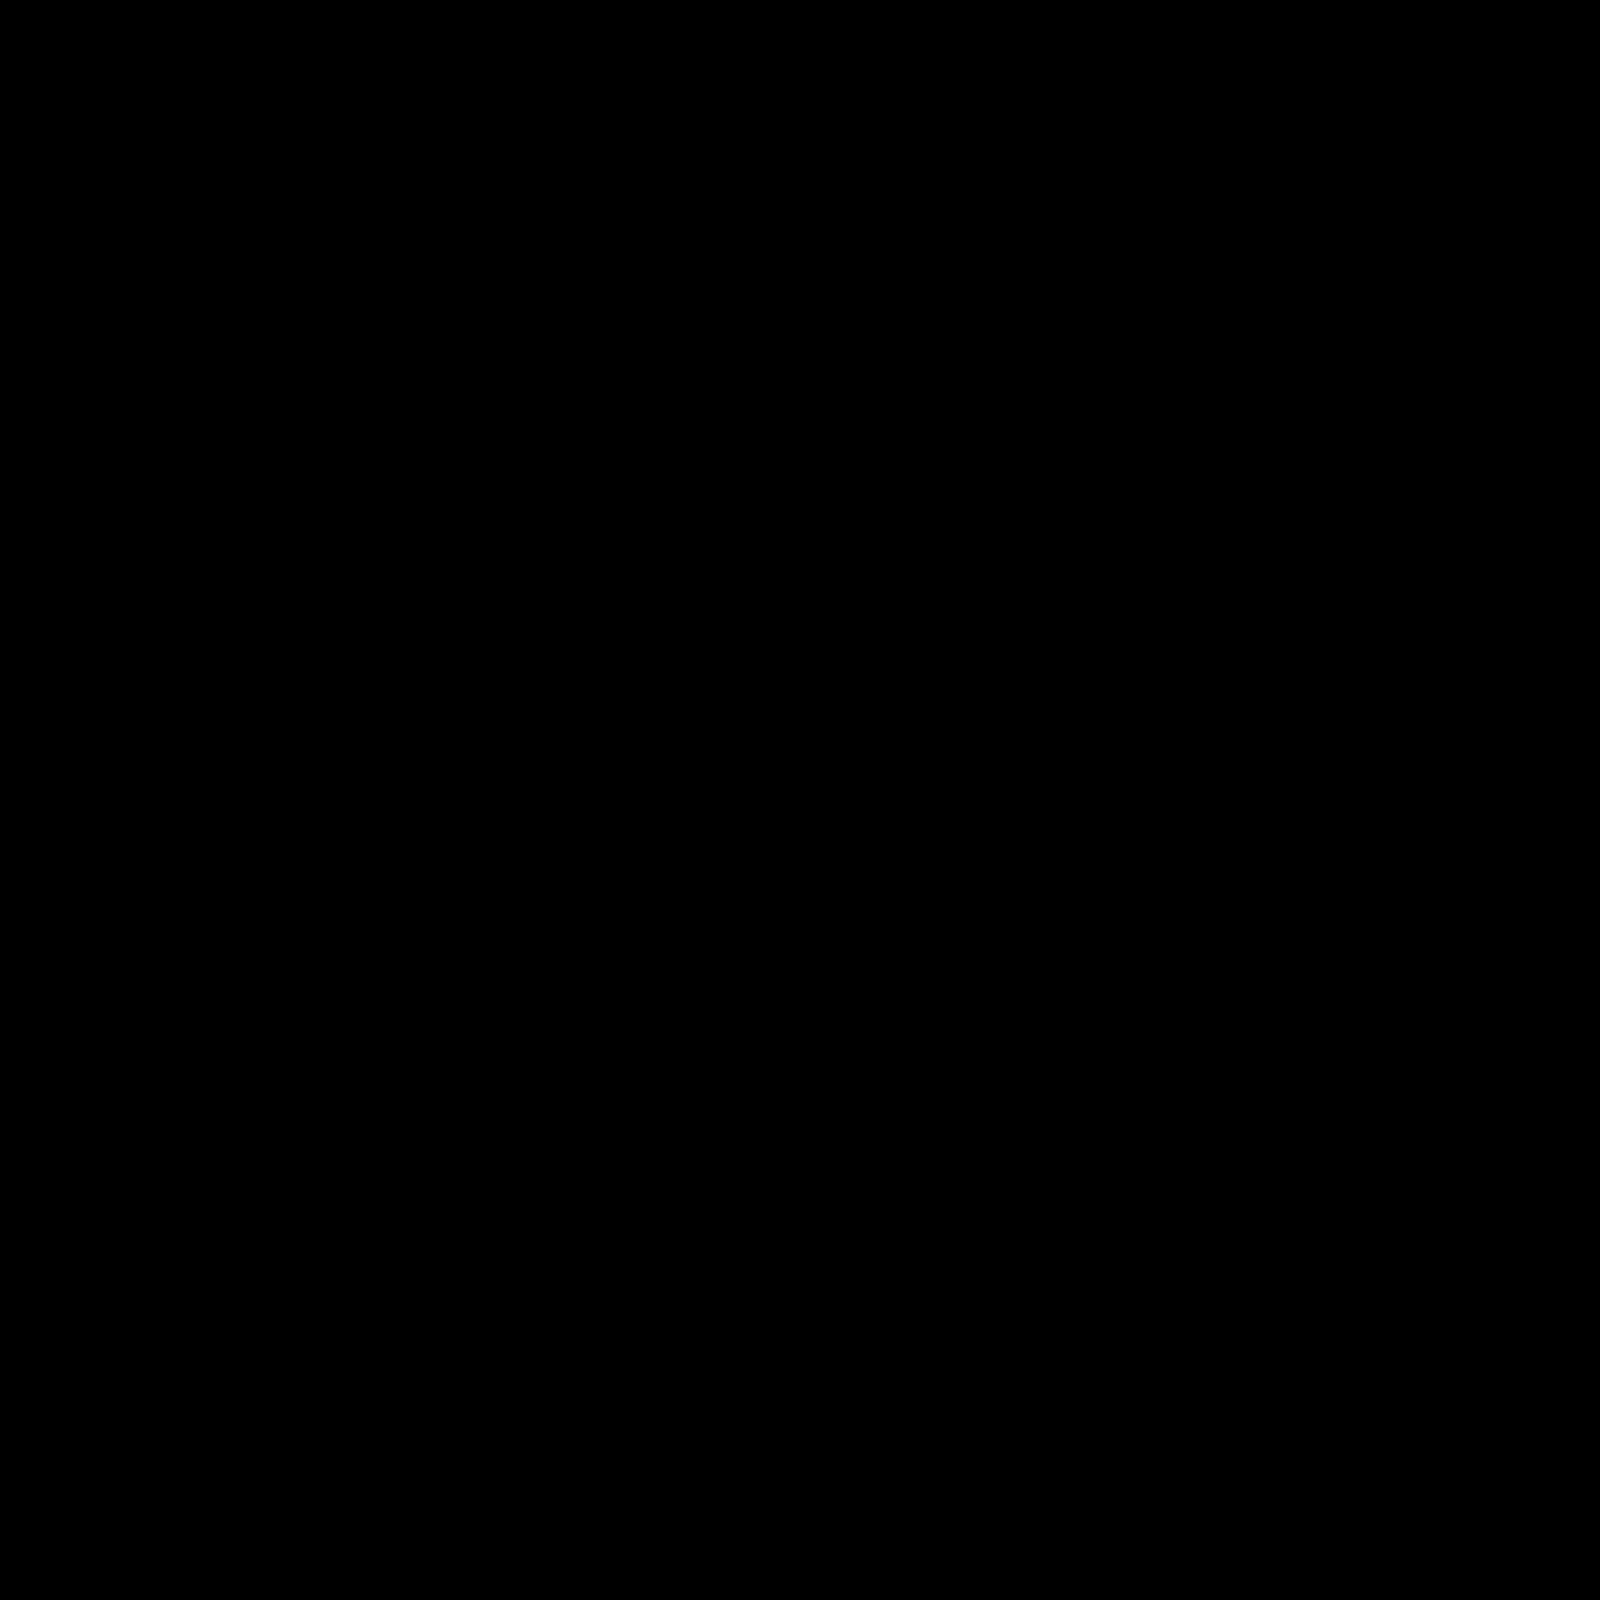 Preisstruktur icon